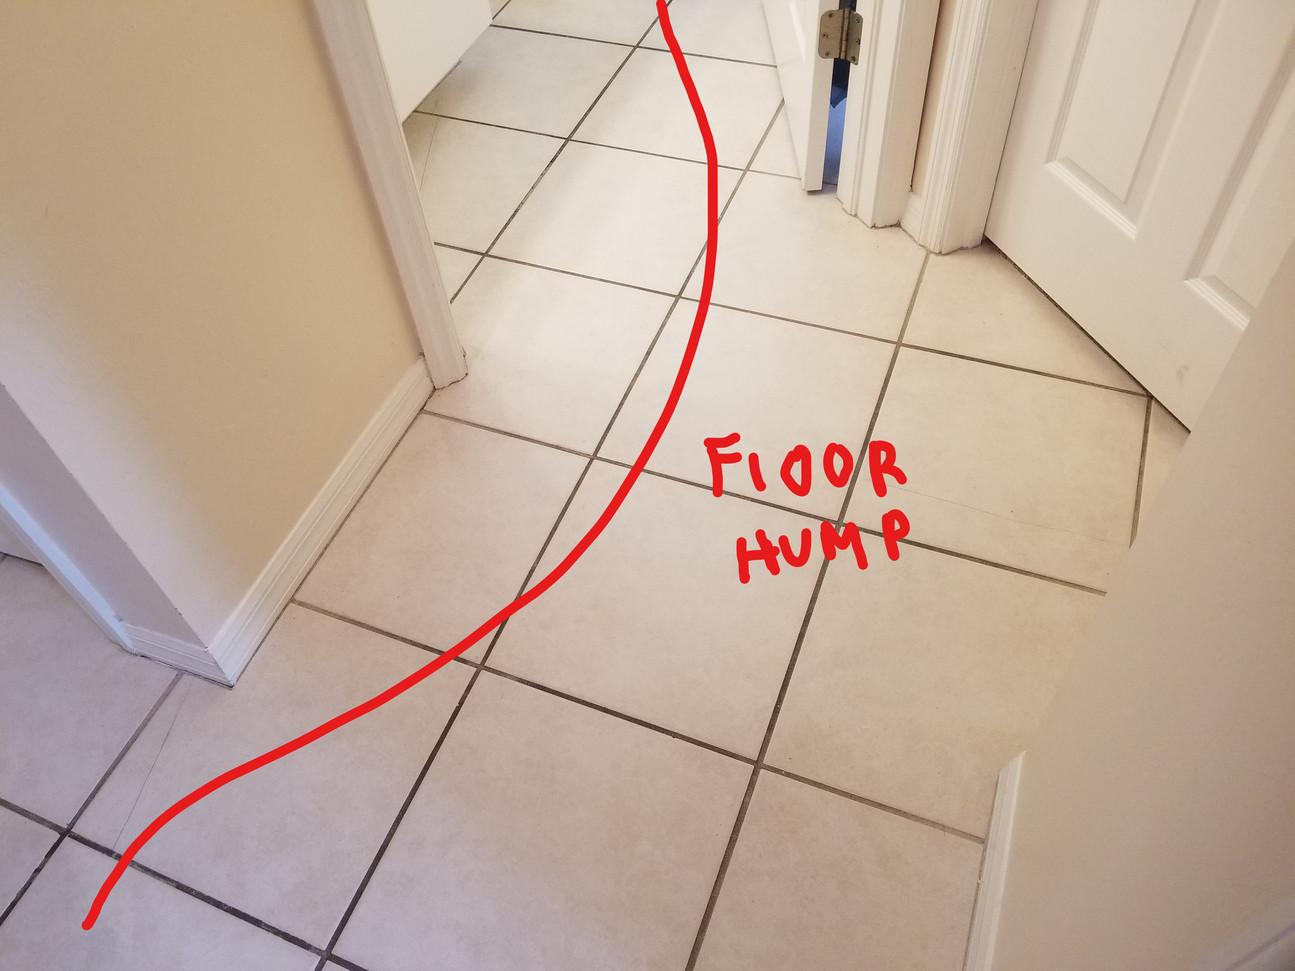 Floor Hump.jpg